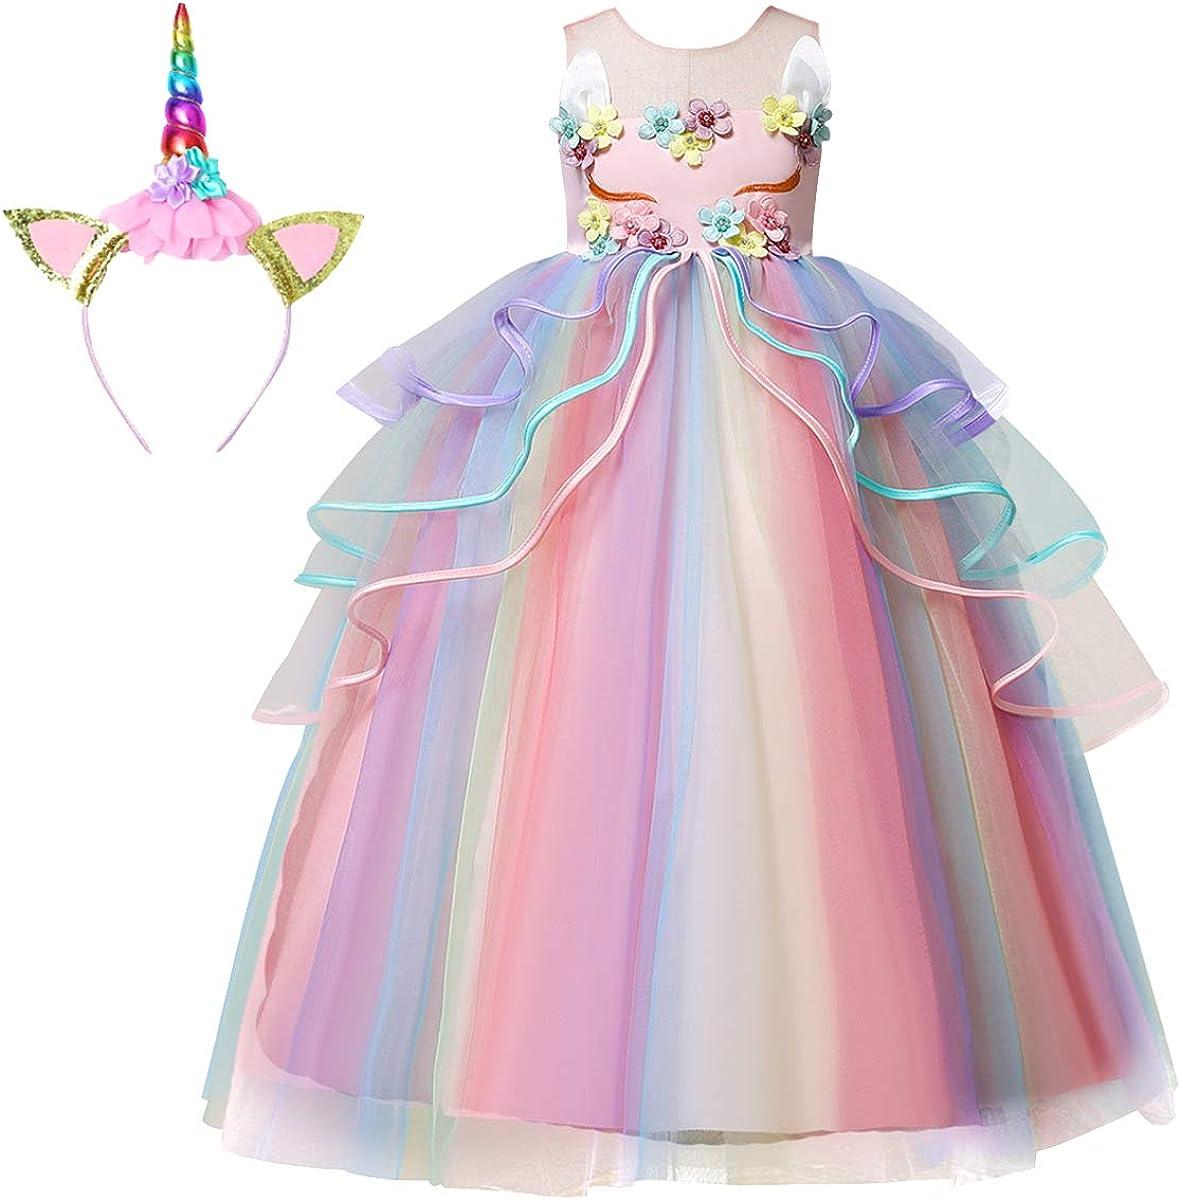 Soyoekbt Girls Unicorn Costume for Kids Dress Up Clothes Unicorn Tutu with Headband Birthday Gift